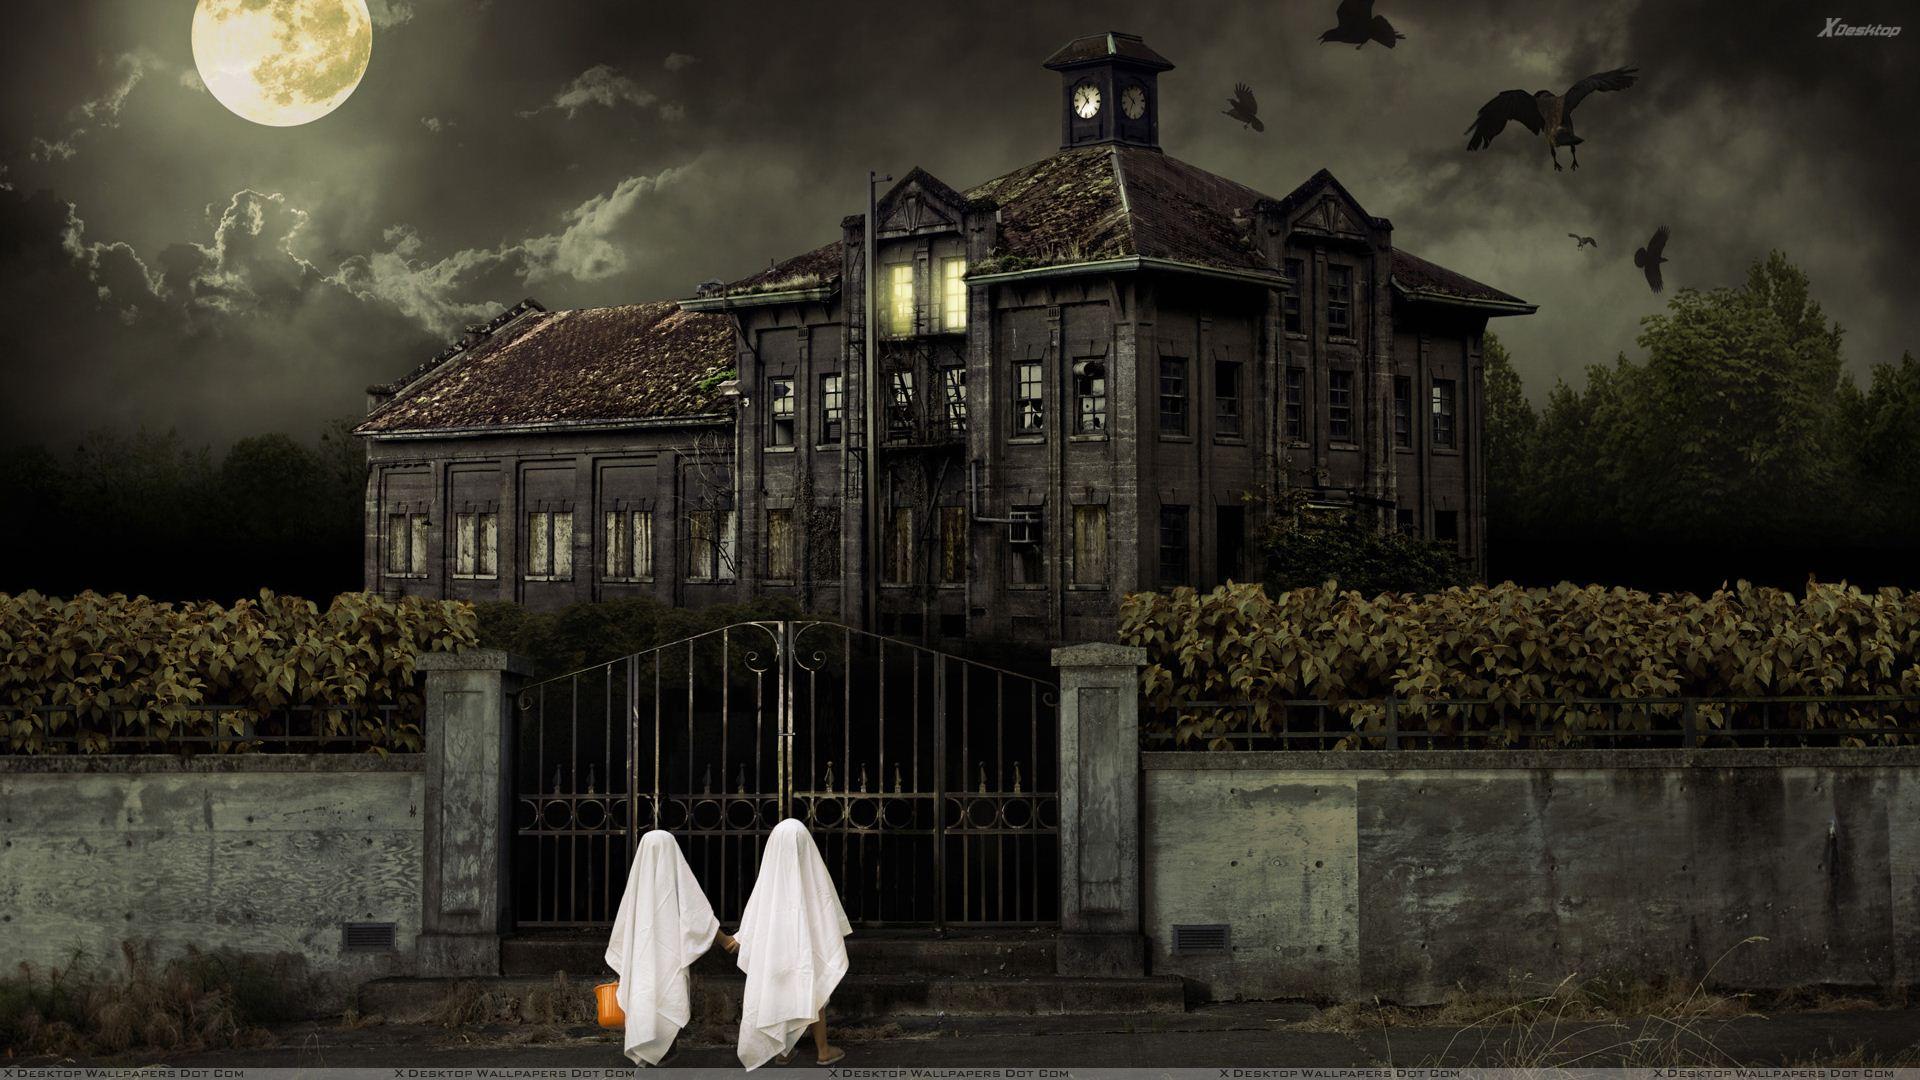 Halloween Scary House Night Scene Wallpaper 1920x1080